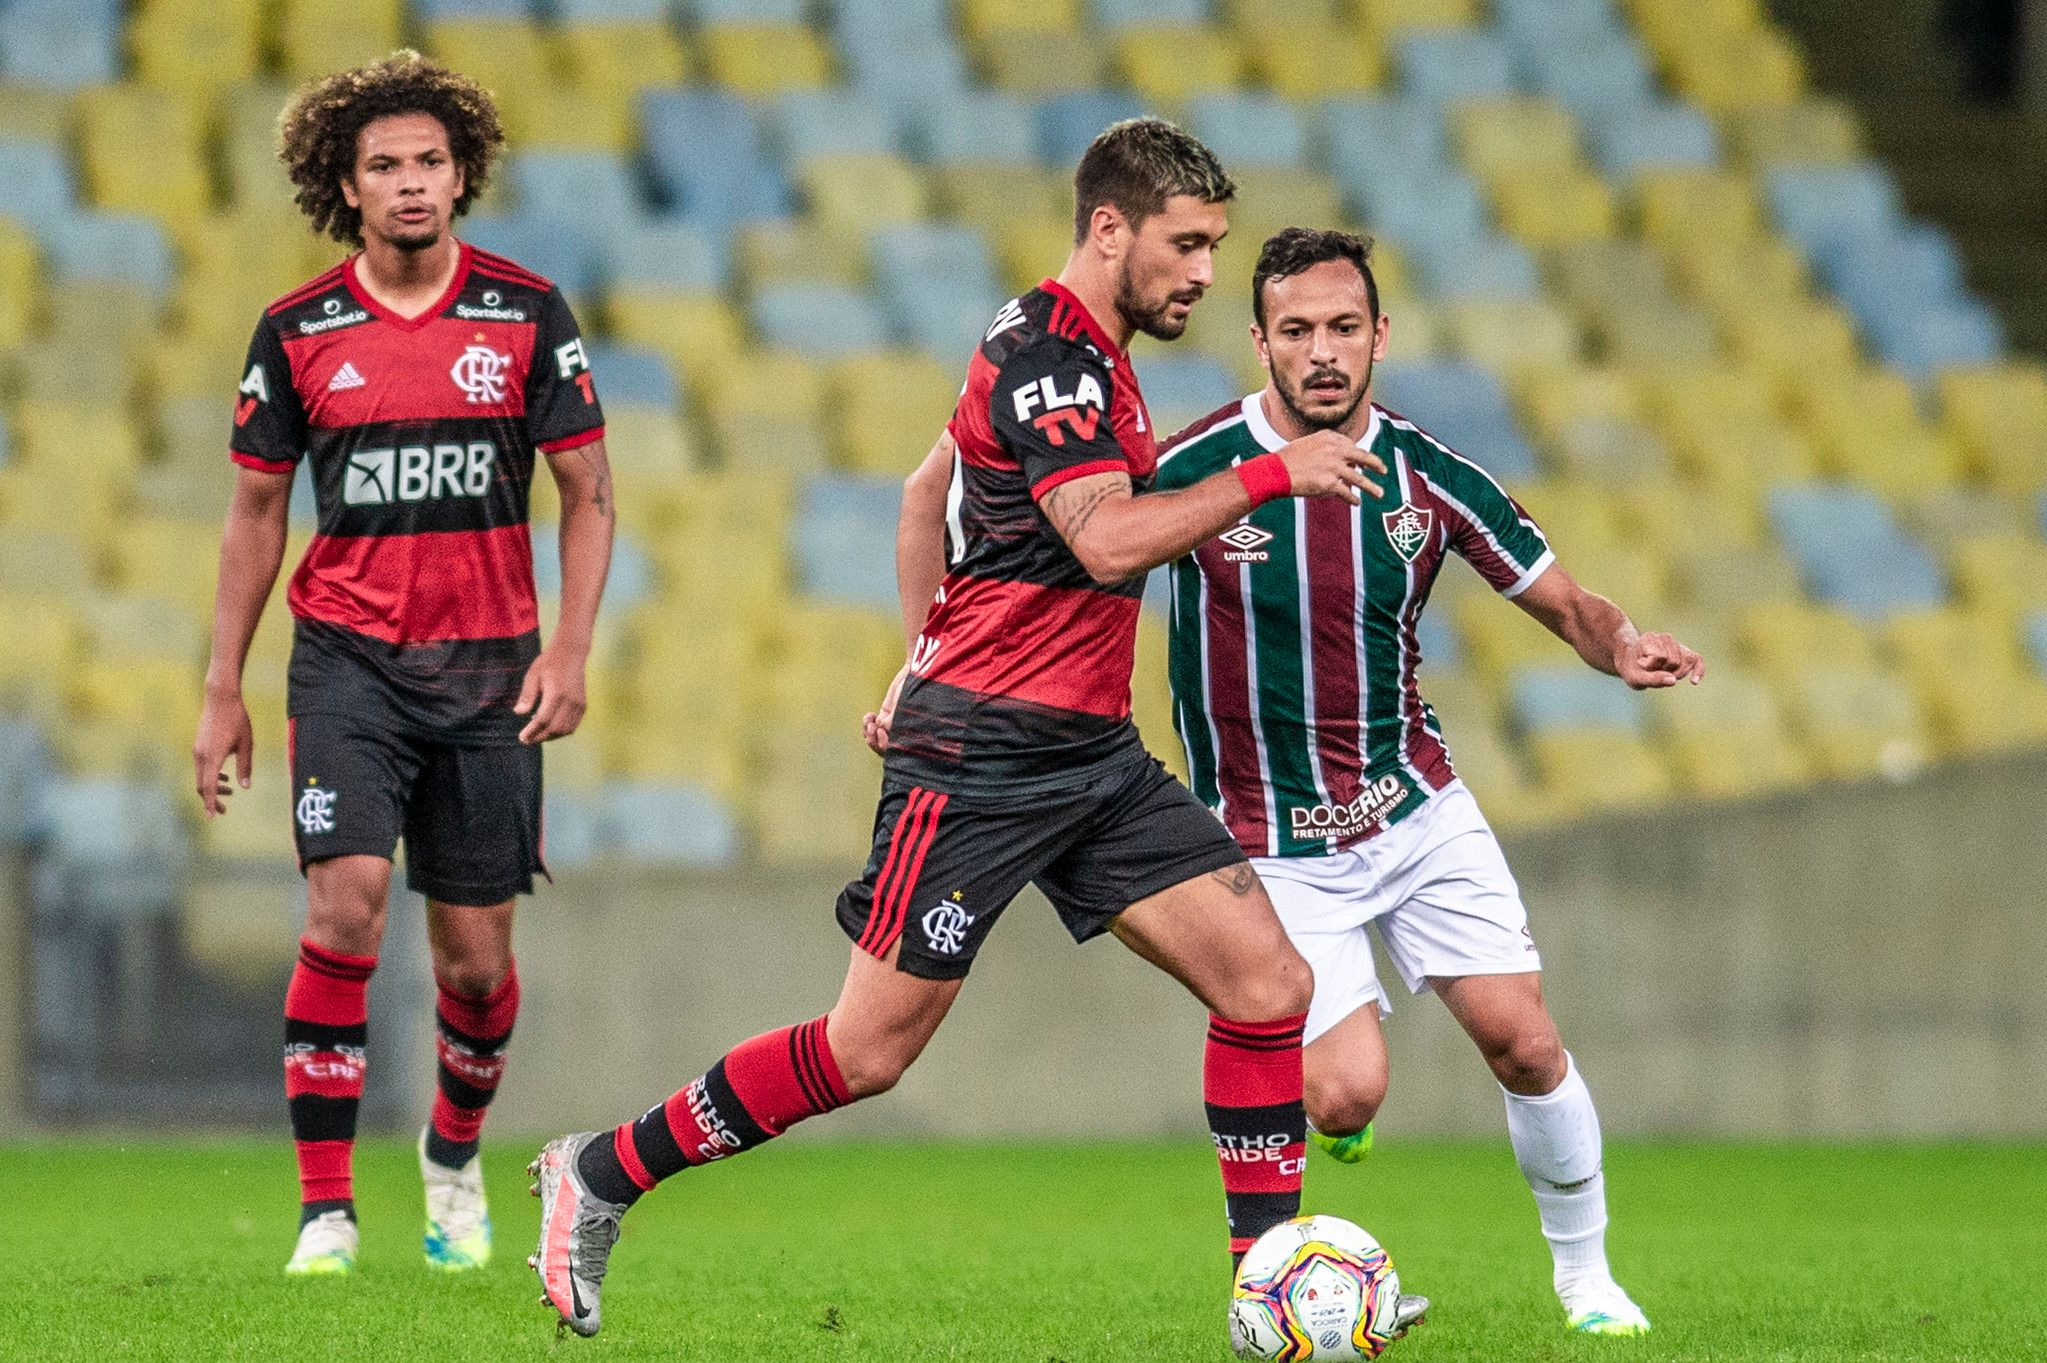 Flamengo segue bem preparado contra Fluminense- Foto: Alex Vidal